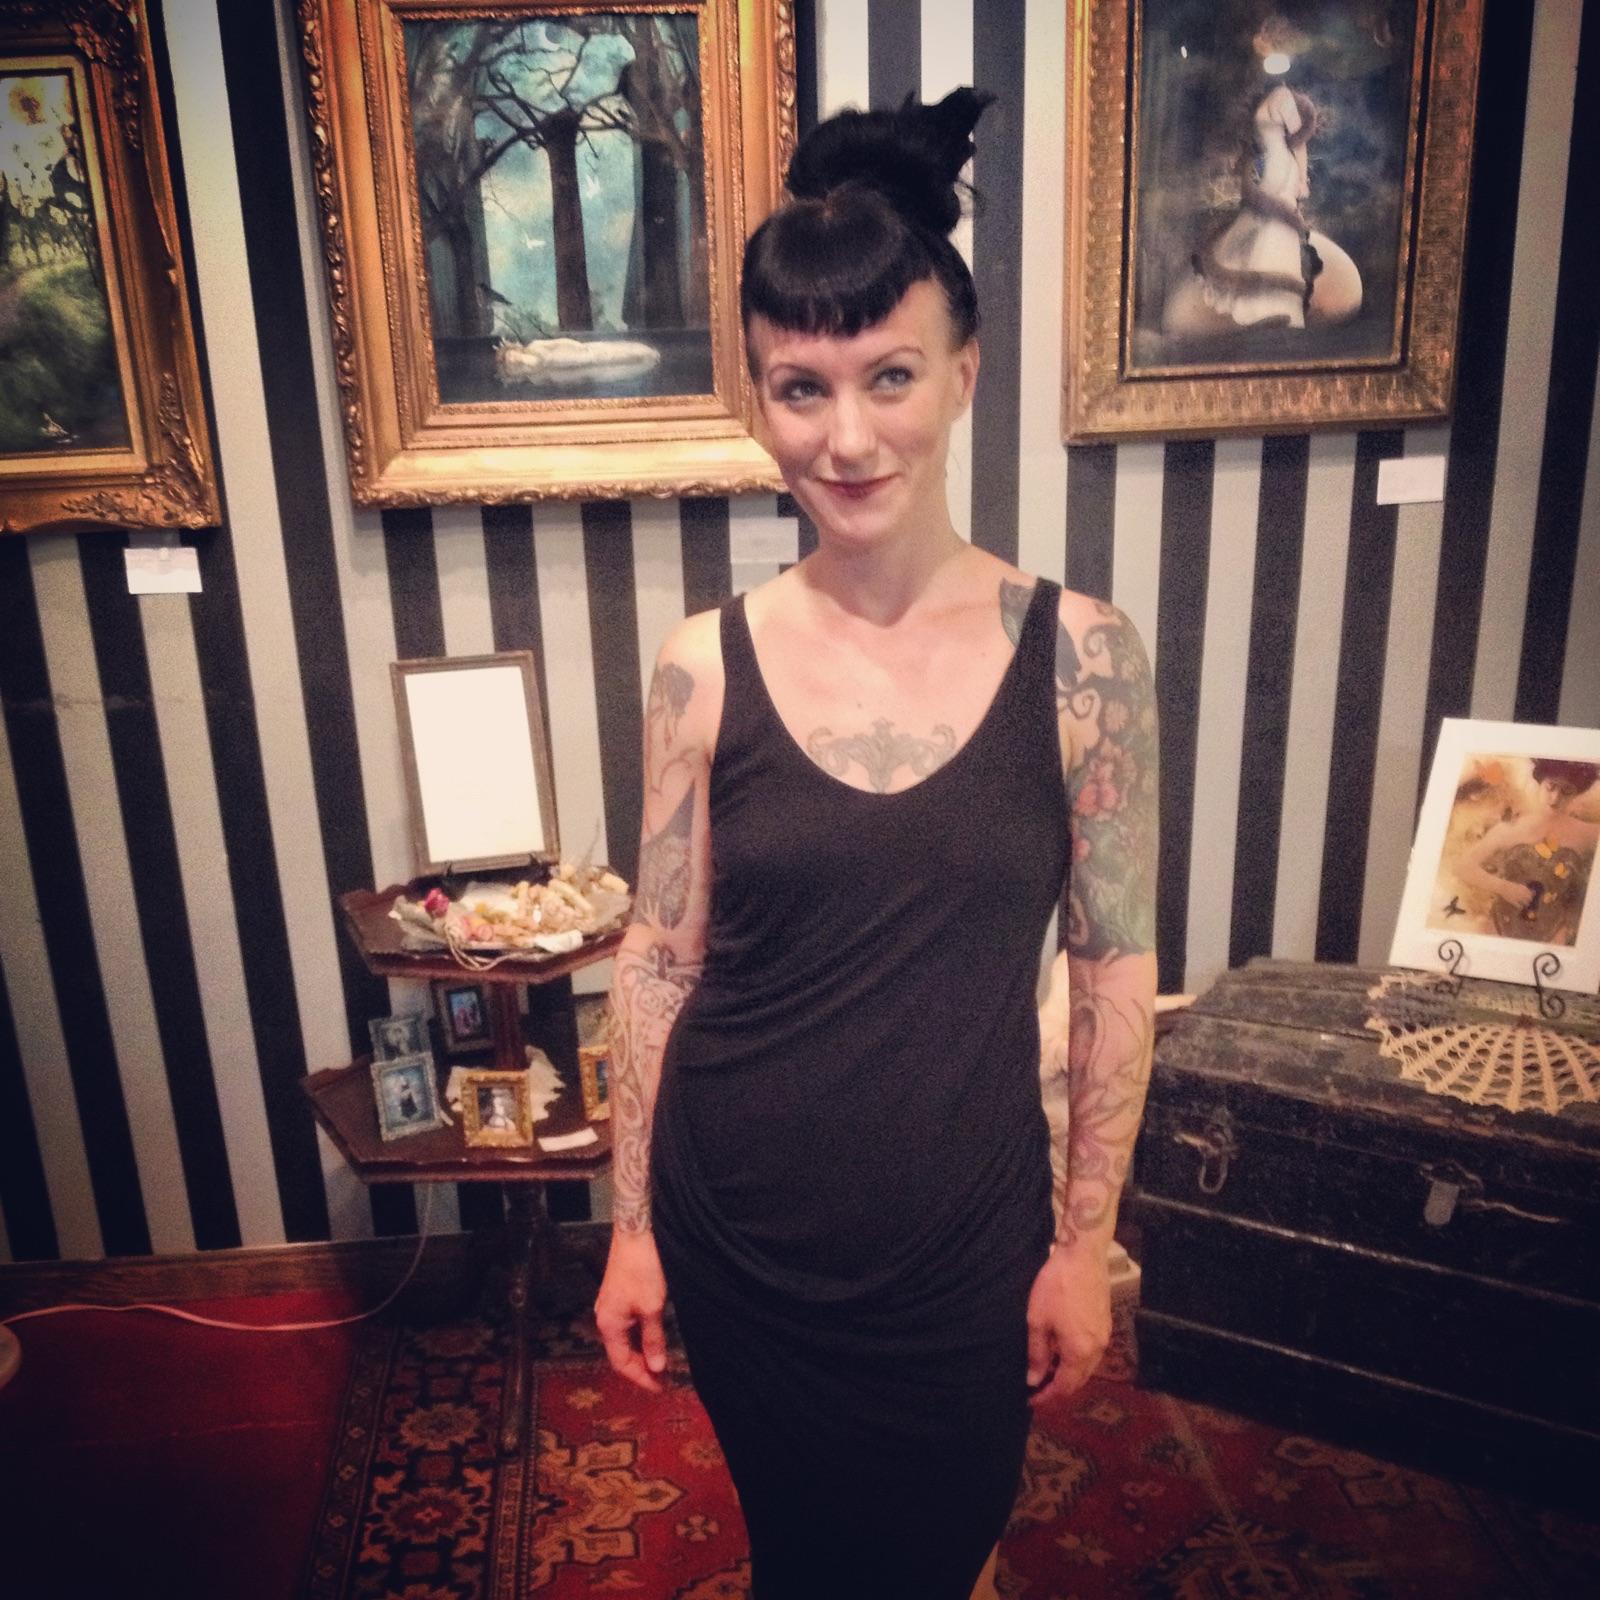 Liz Huston, 2015. Photo by the marvelous Sam Litzinger.